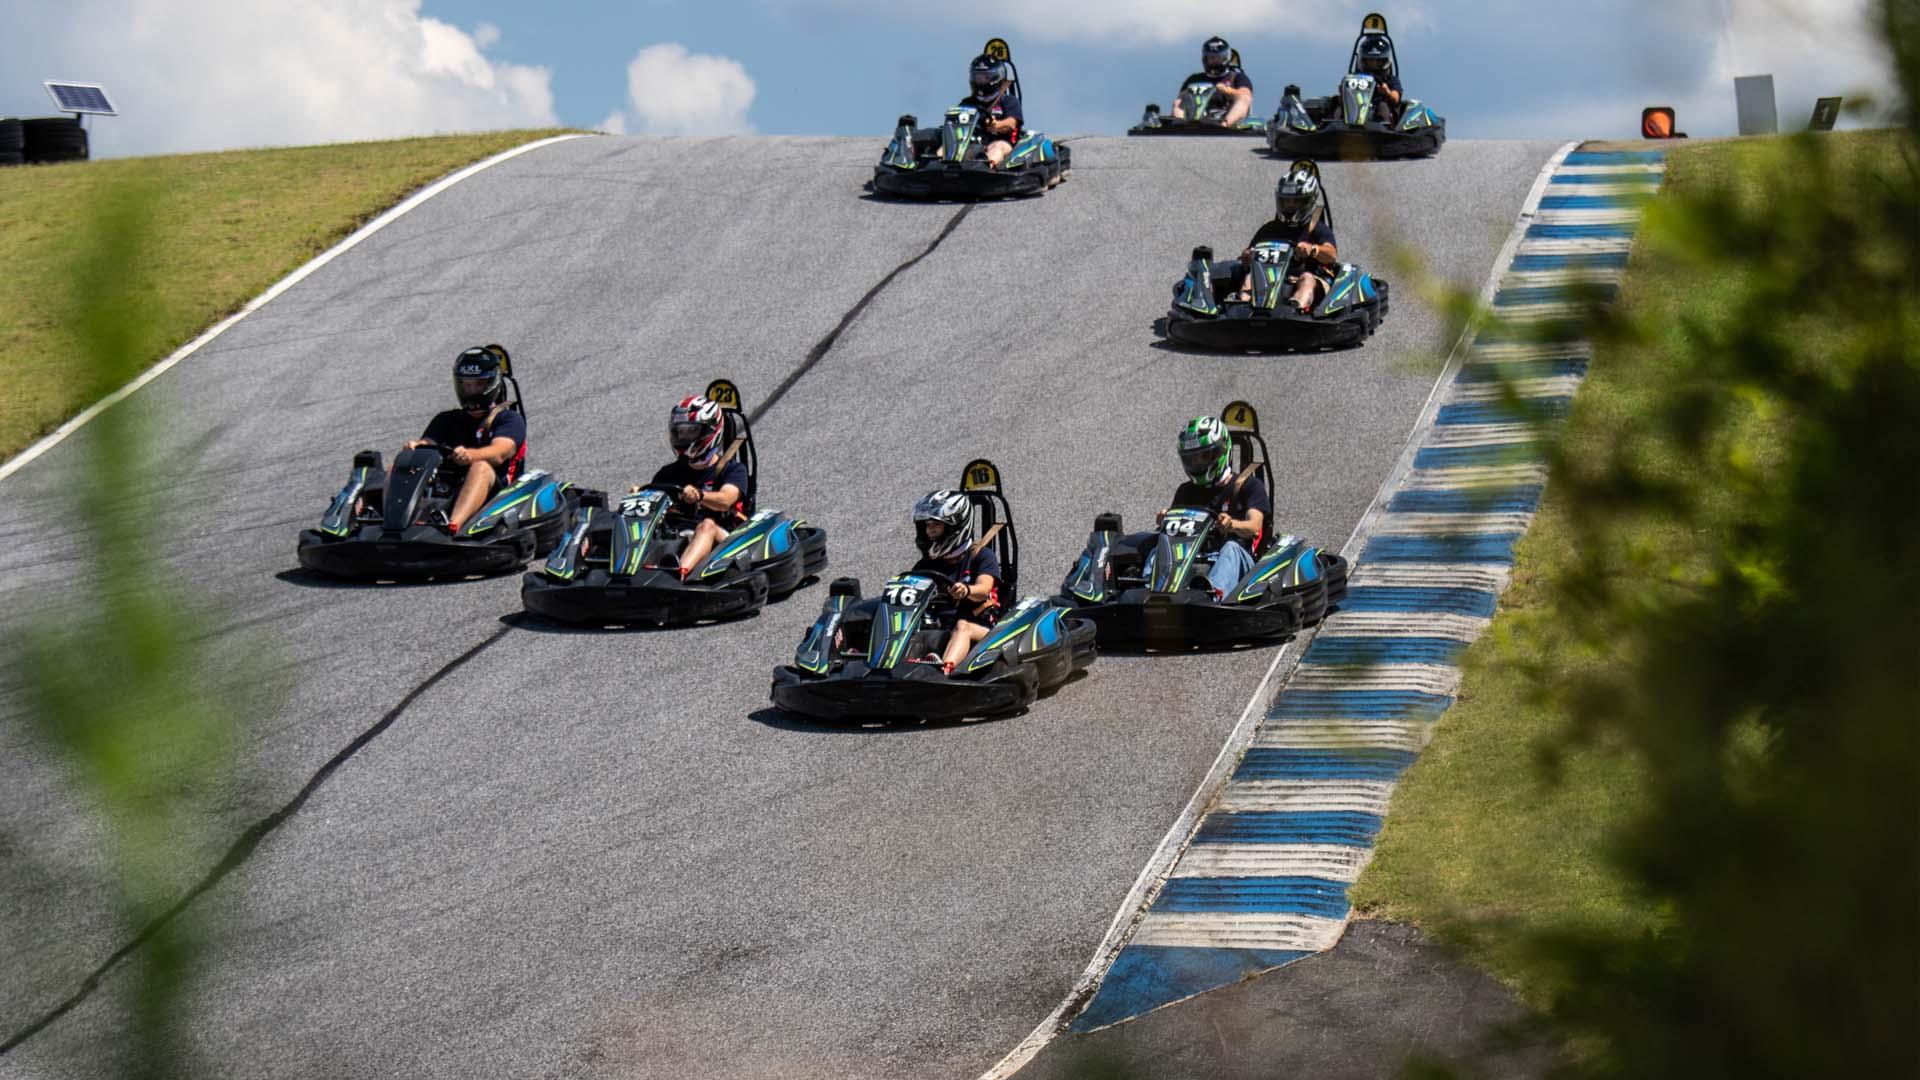 karting web1 - Karting First Impressions